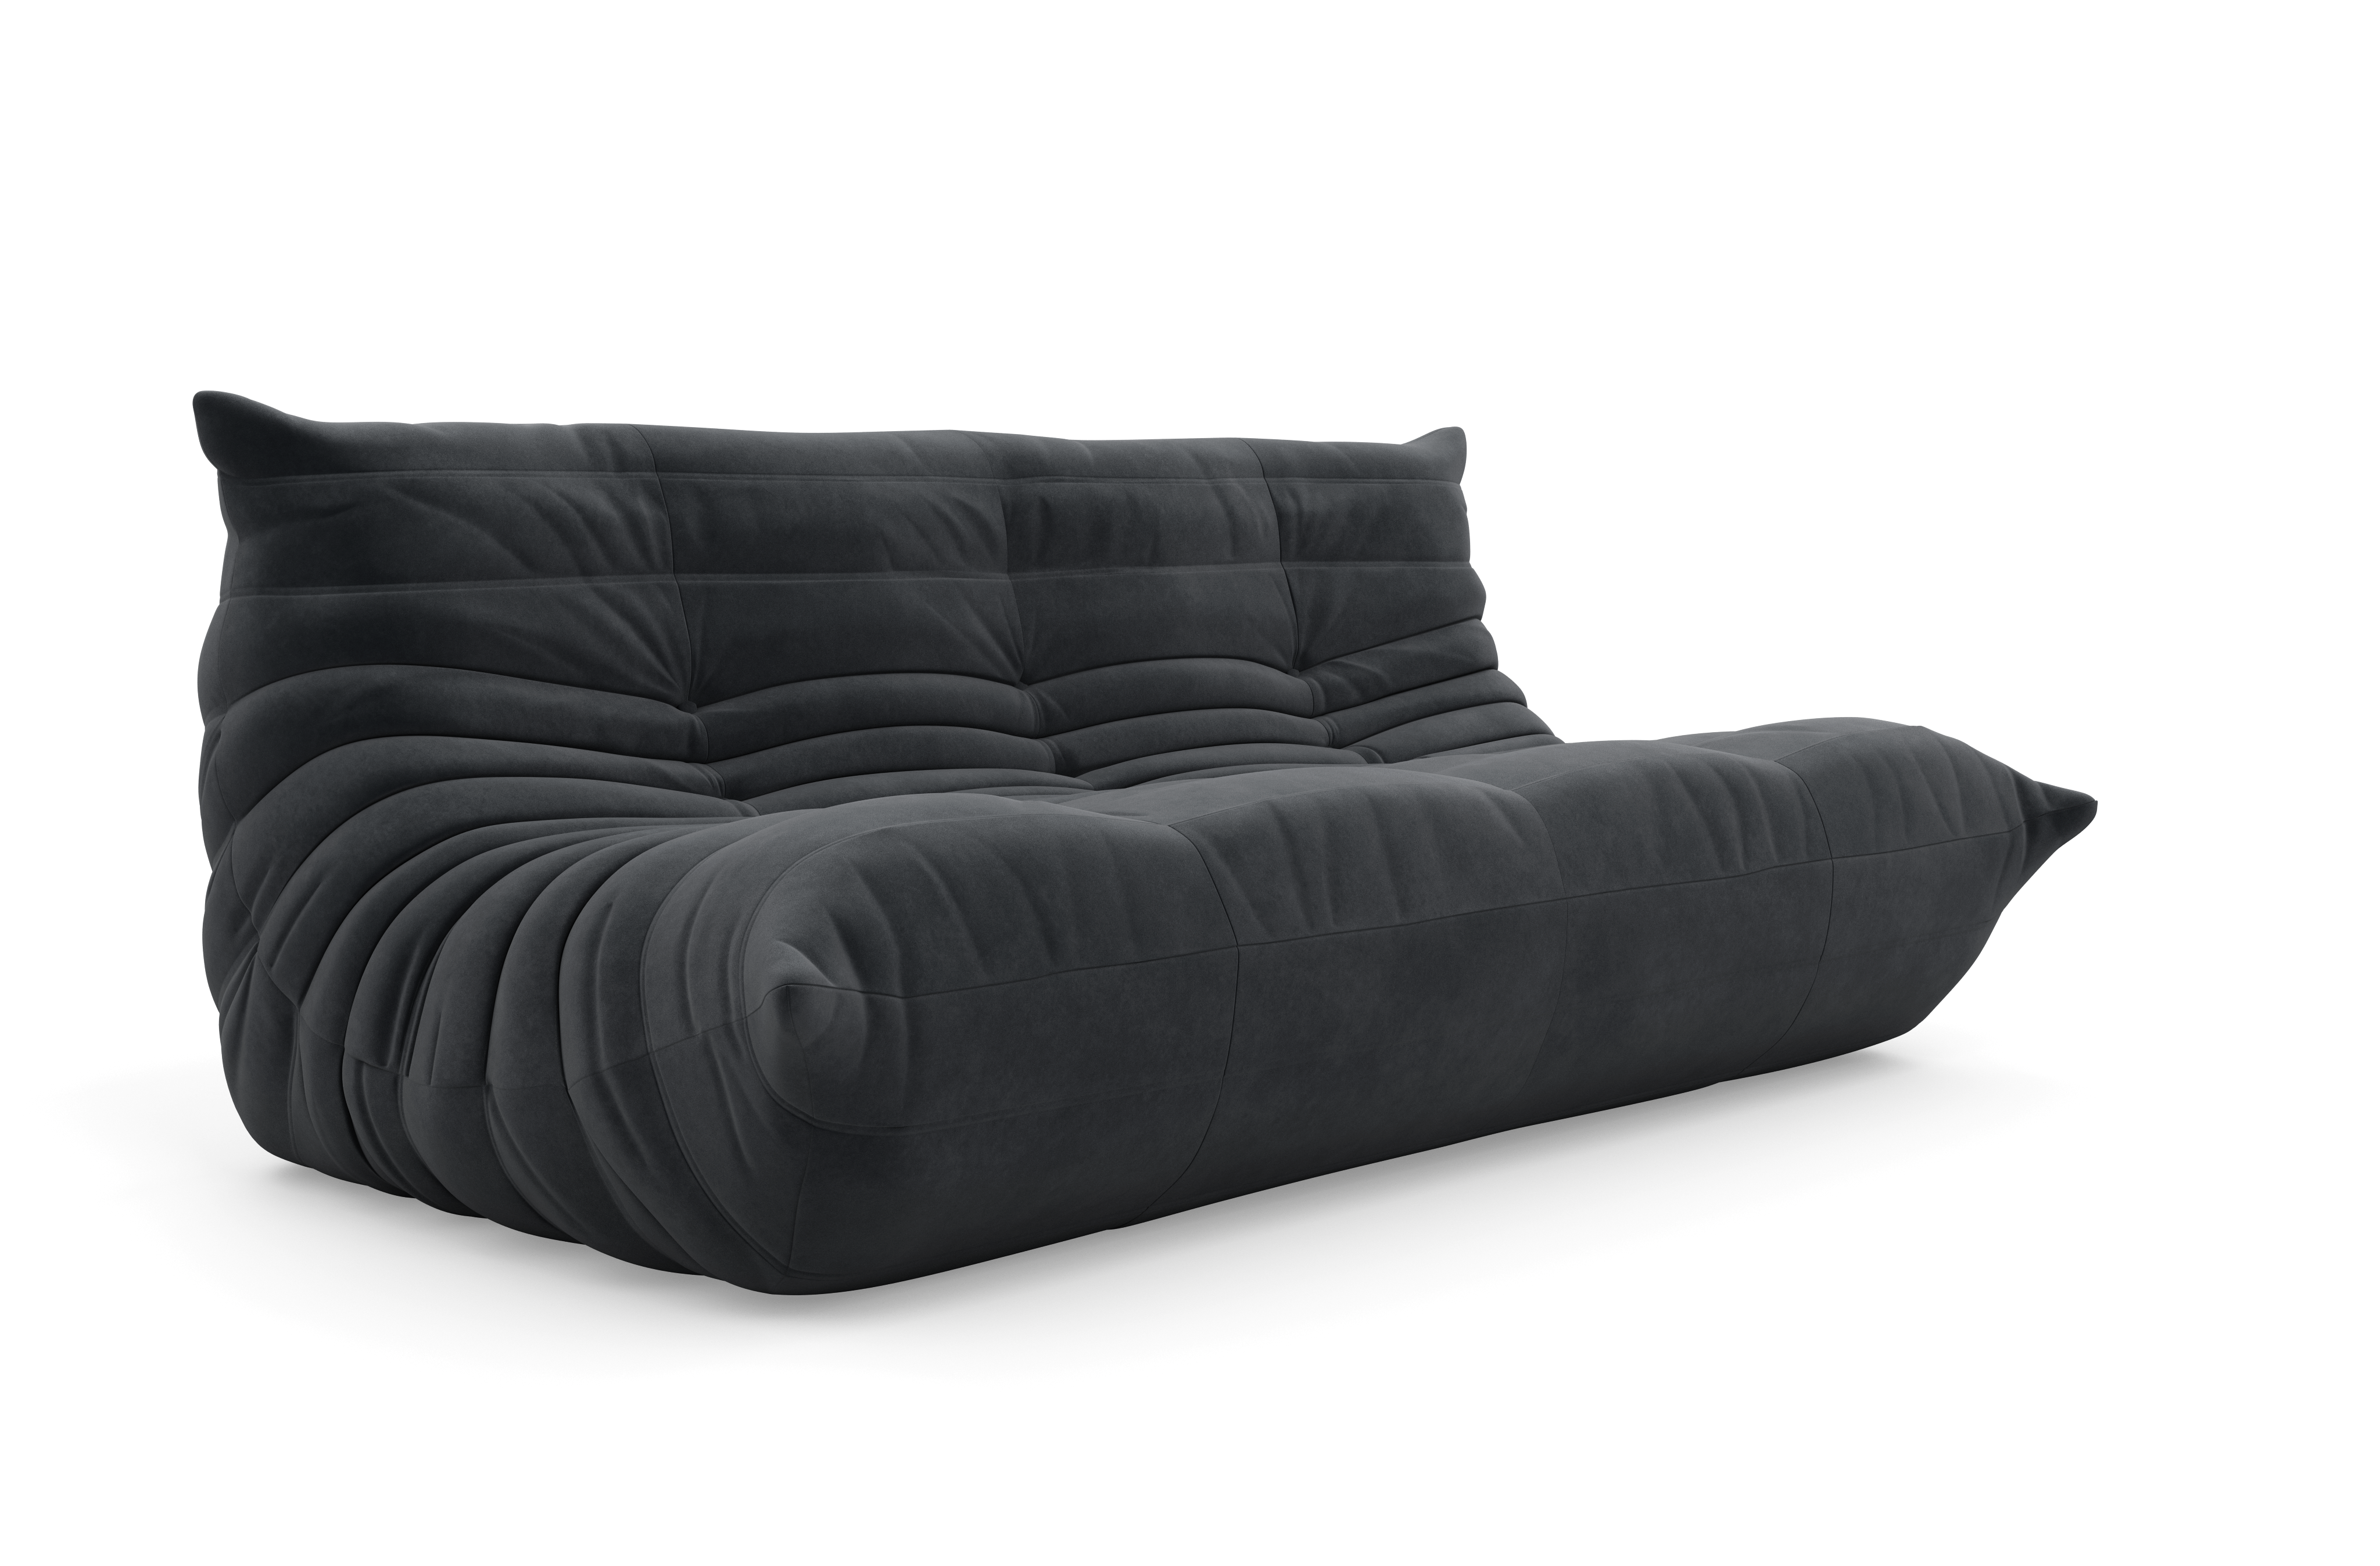 Togo Sofa Price Stonehenge Ligne Roset French Design Avail Home